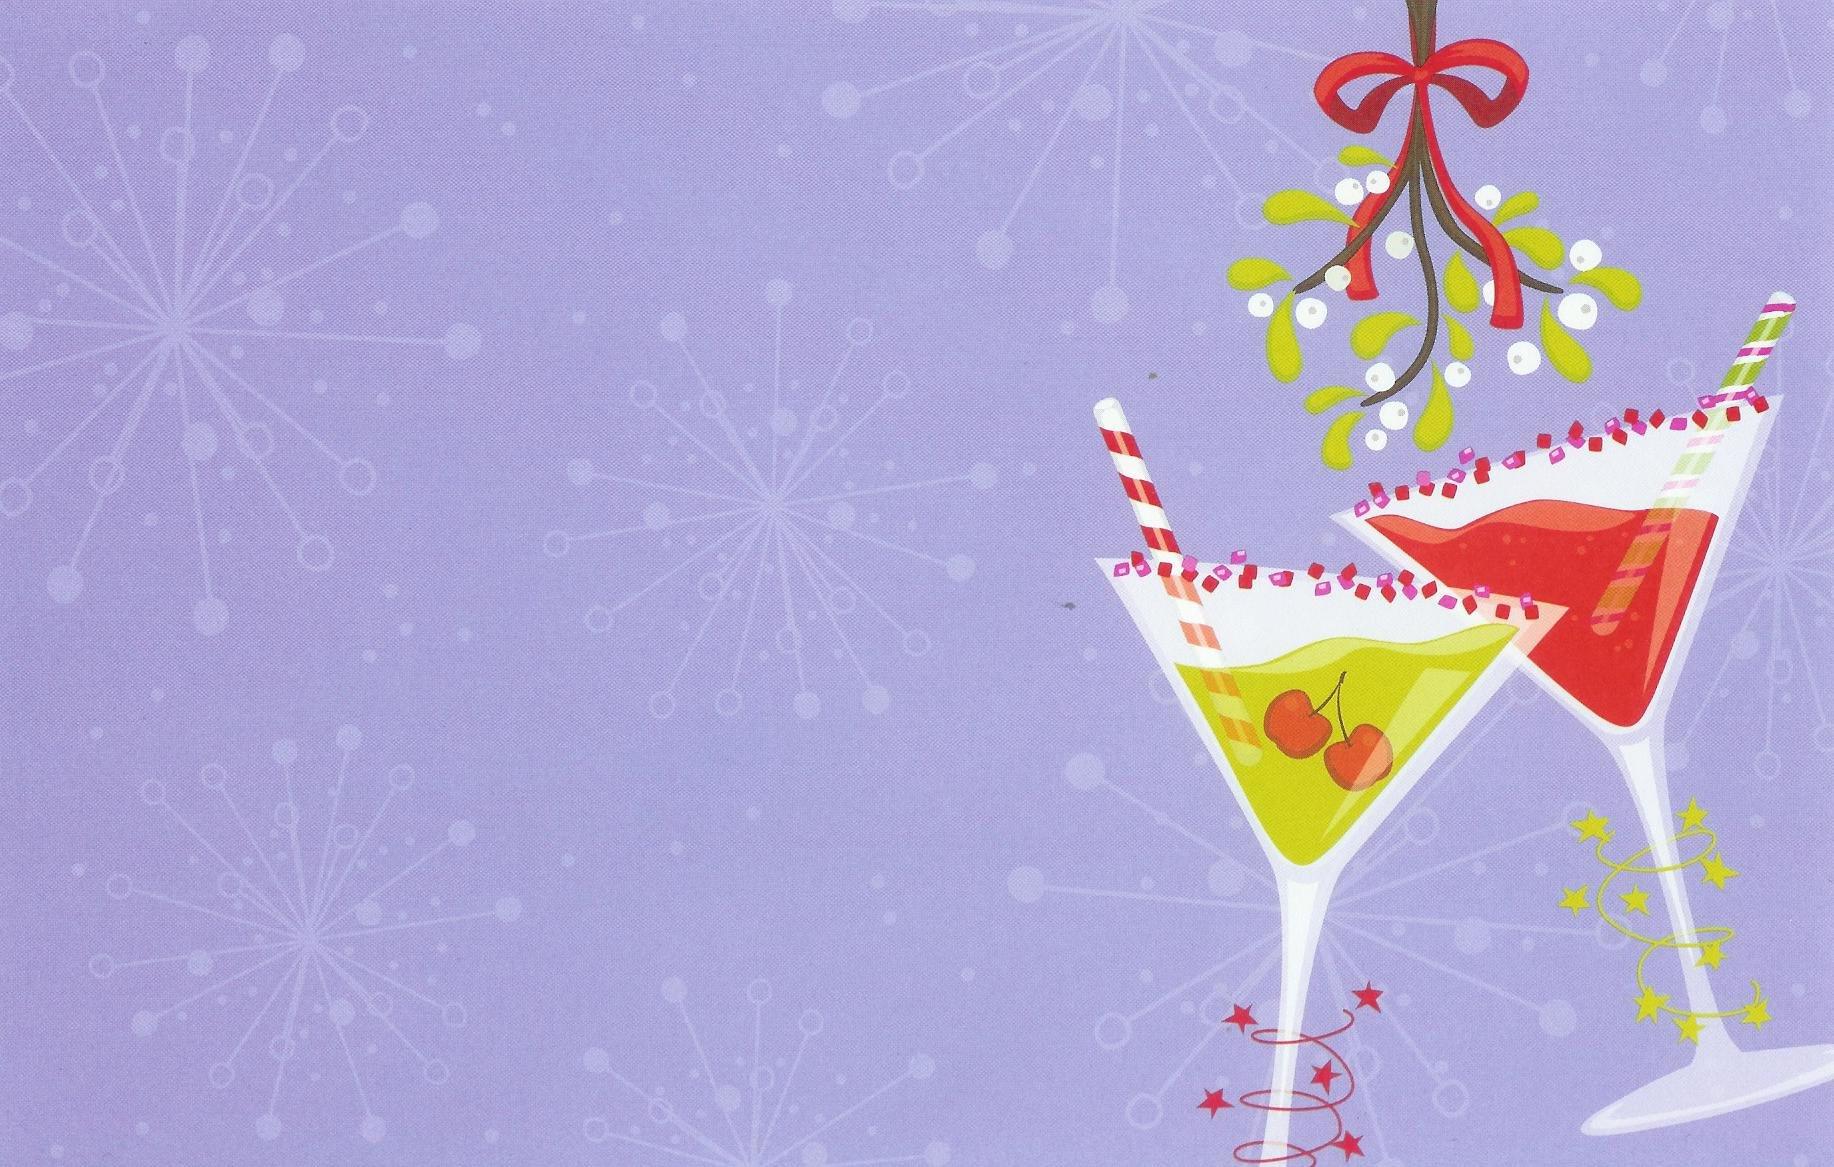 Cocktail Party Invite Templates Elegant Holiday Cocktail Party Invitation Template Wcm Corporate